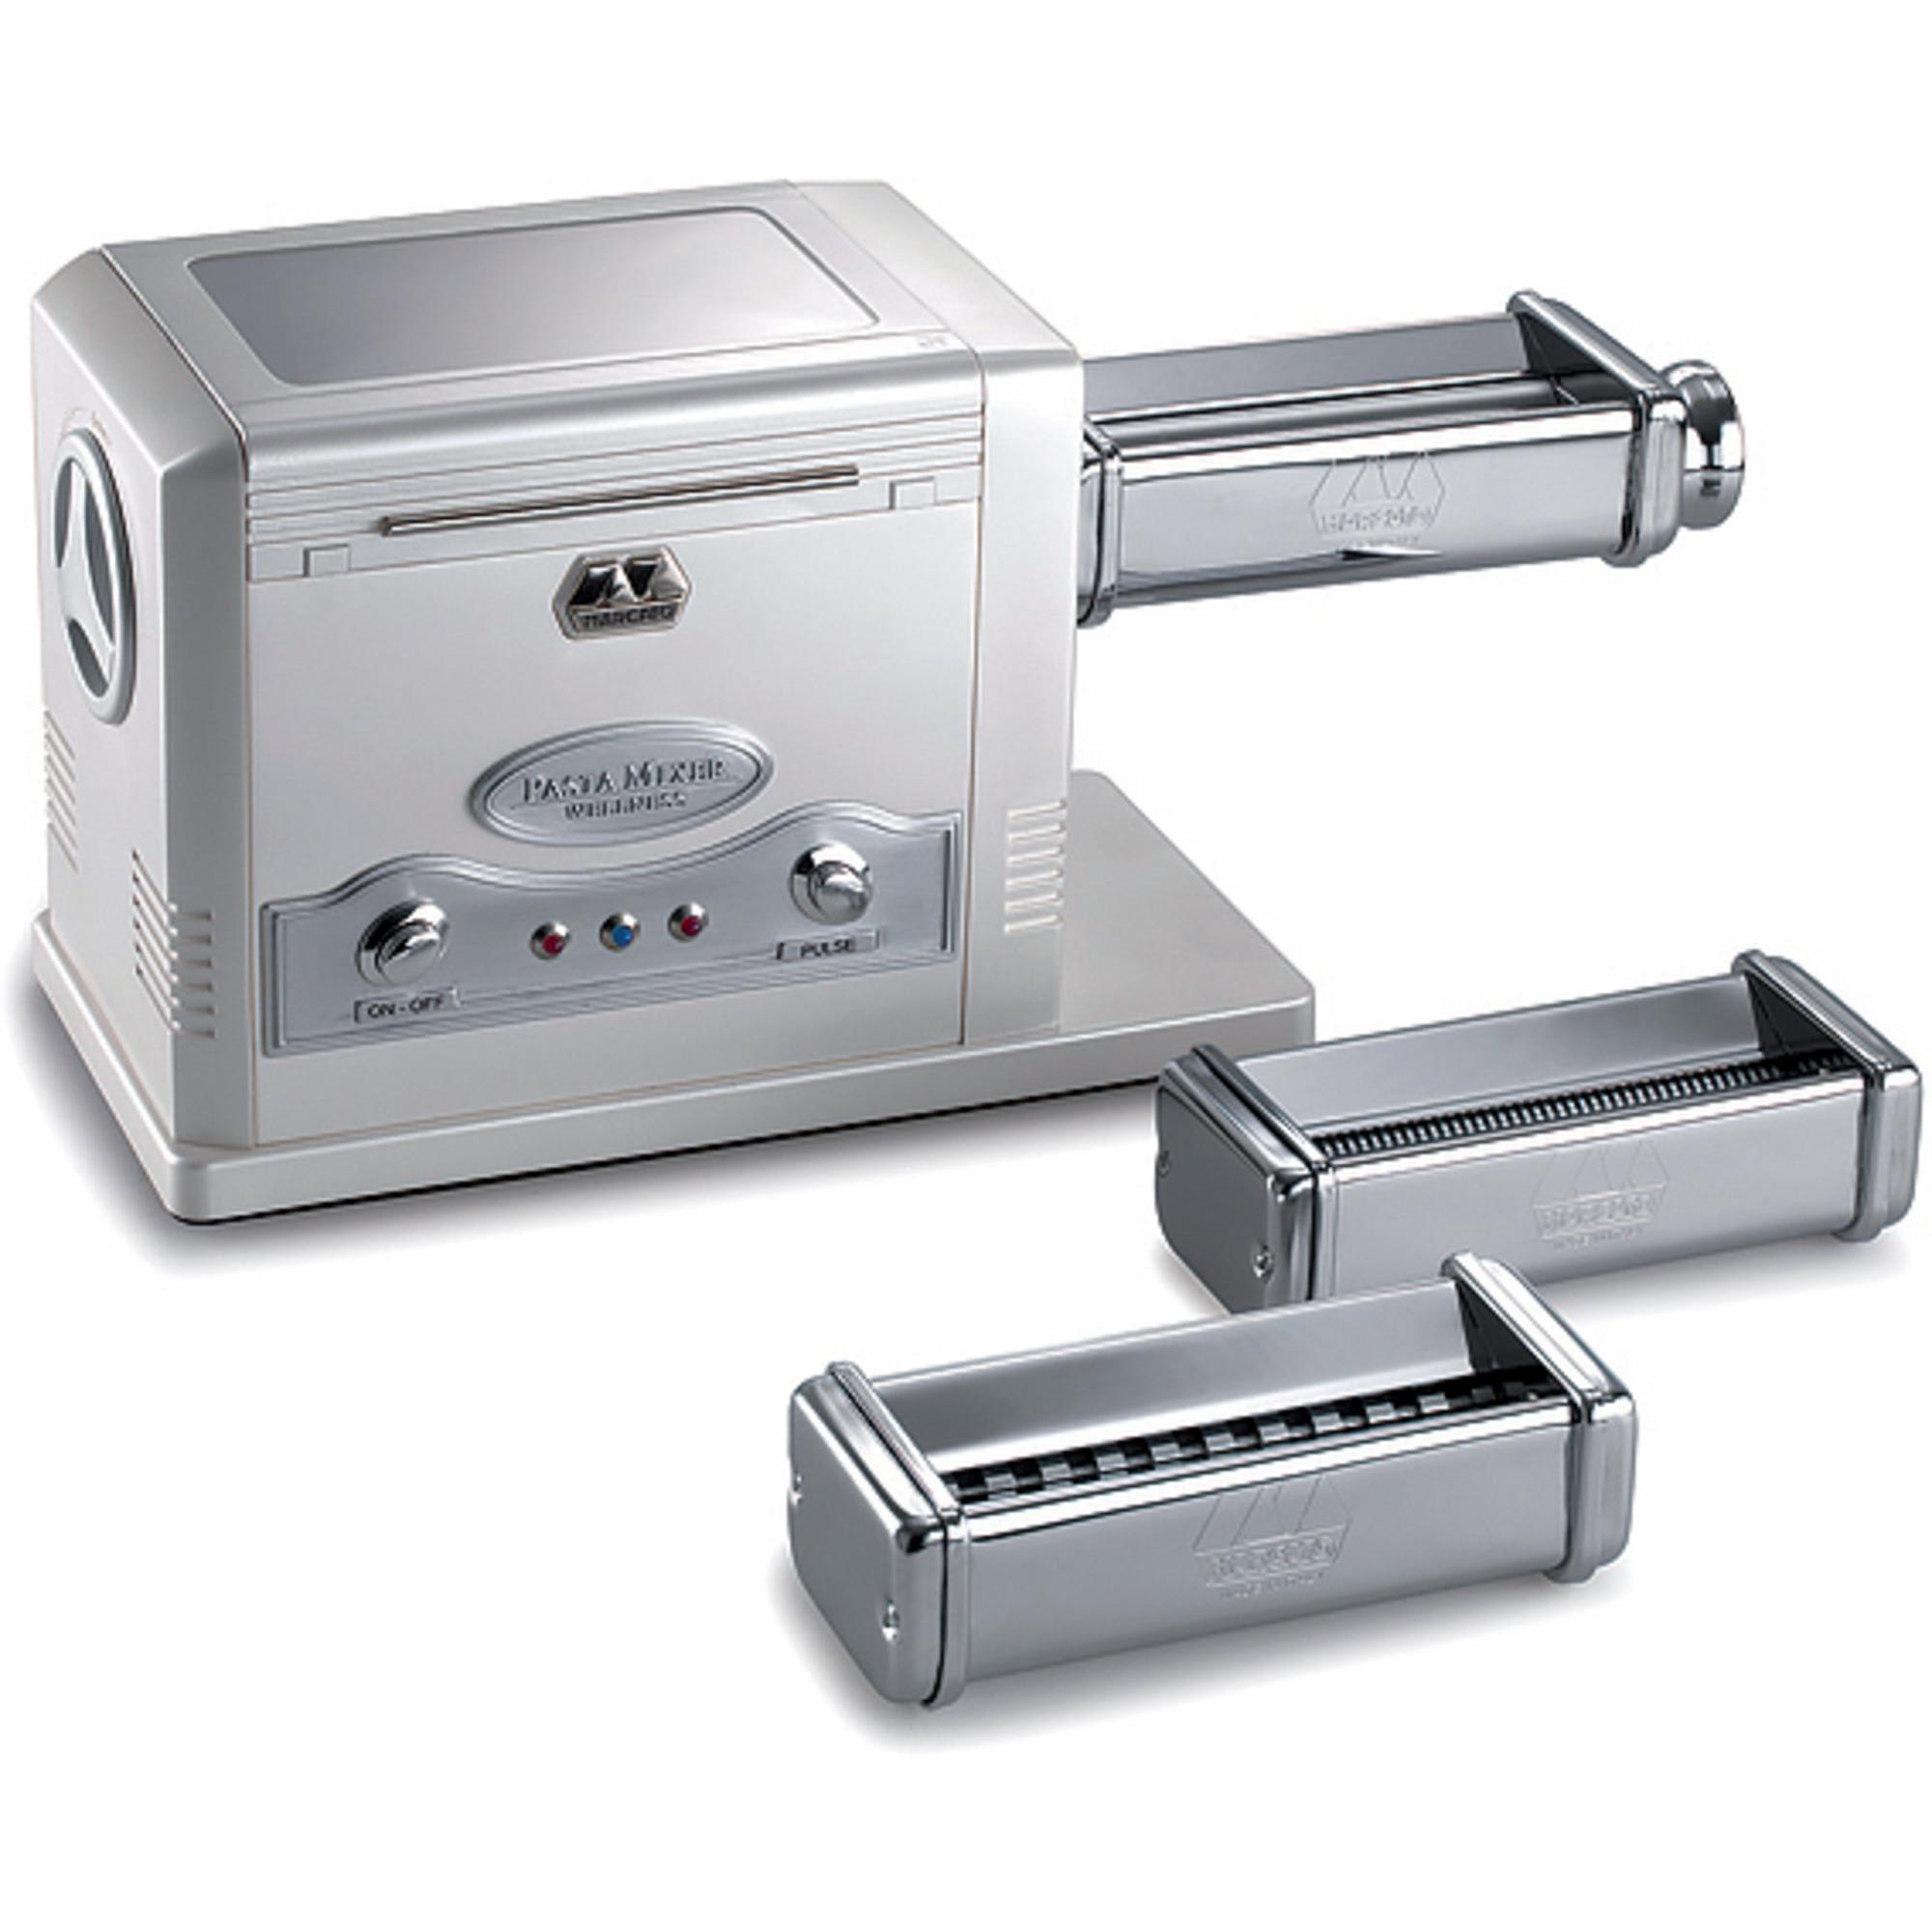 Marcato Elektrisk Pastamaskin Pasta Fresca